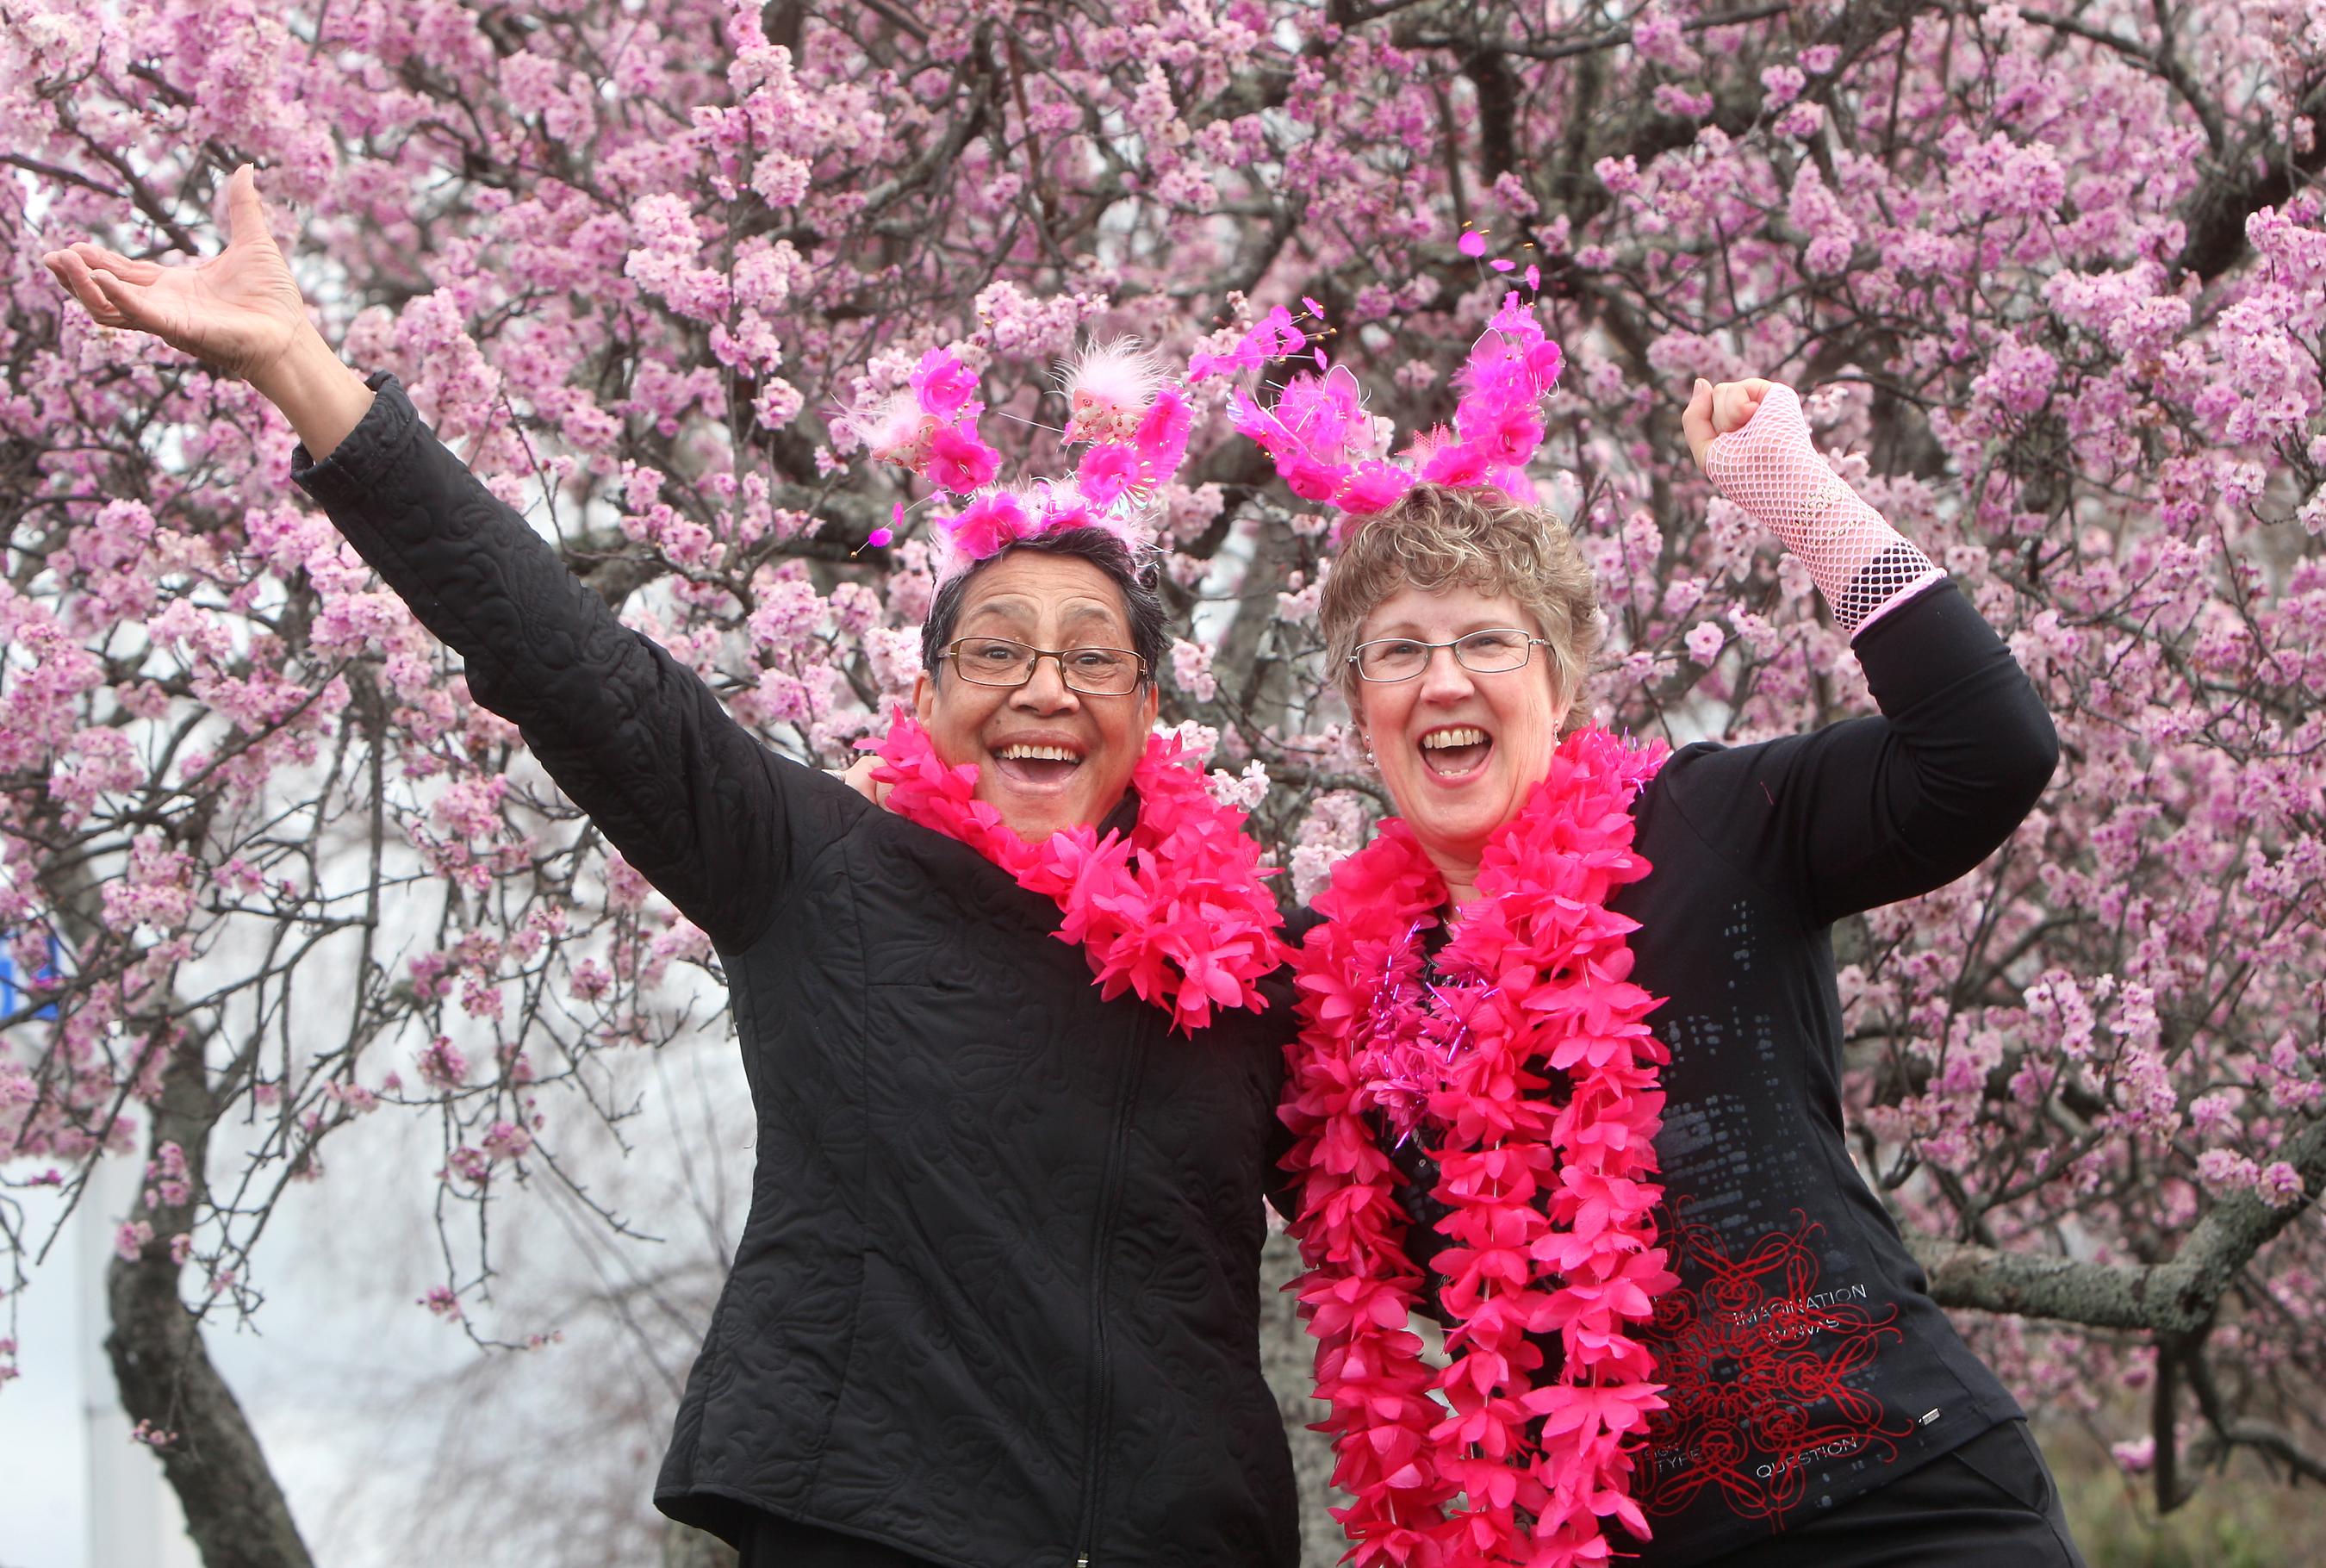 Haehaetu Barret and Robyn Everitt - 2012 Poster Girls